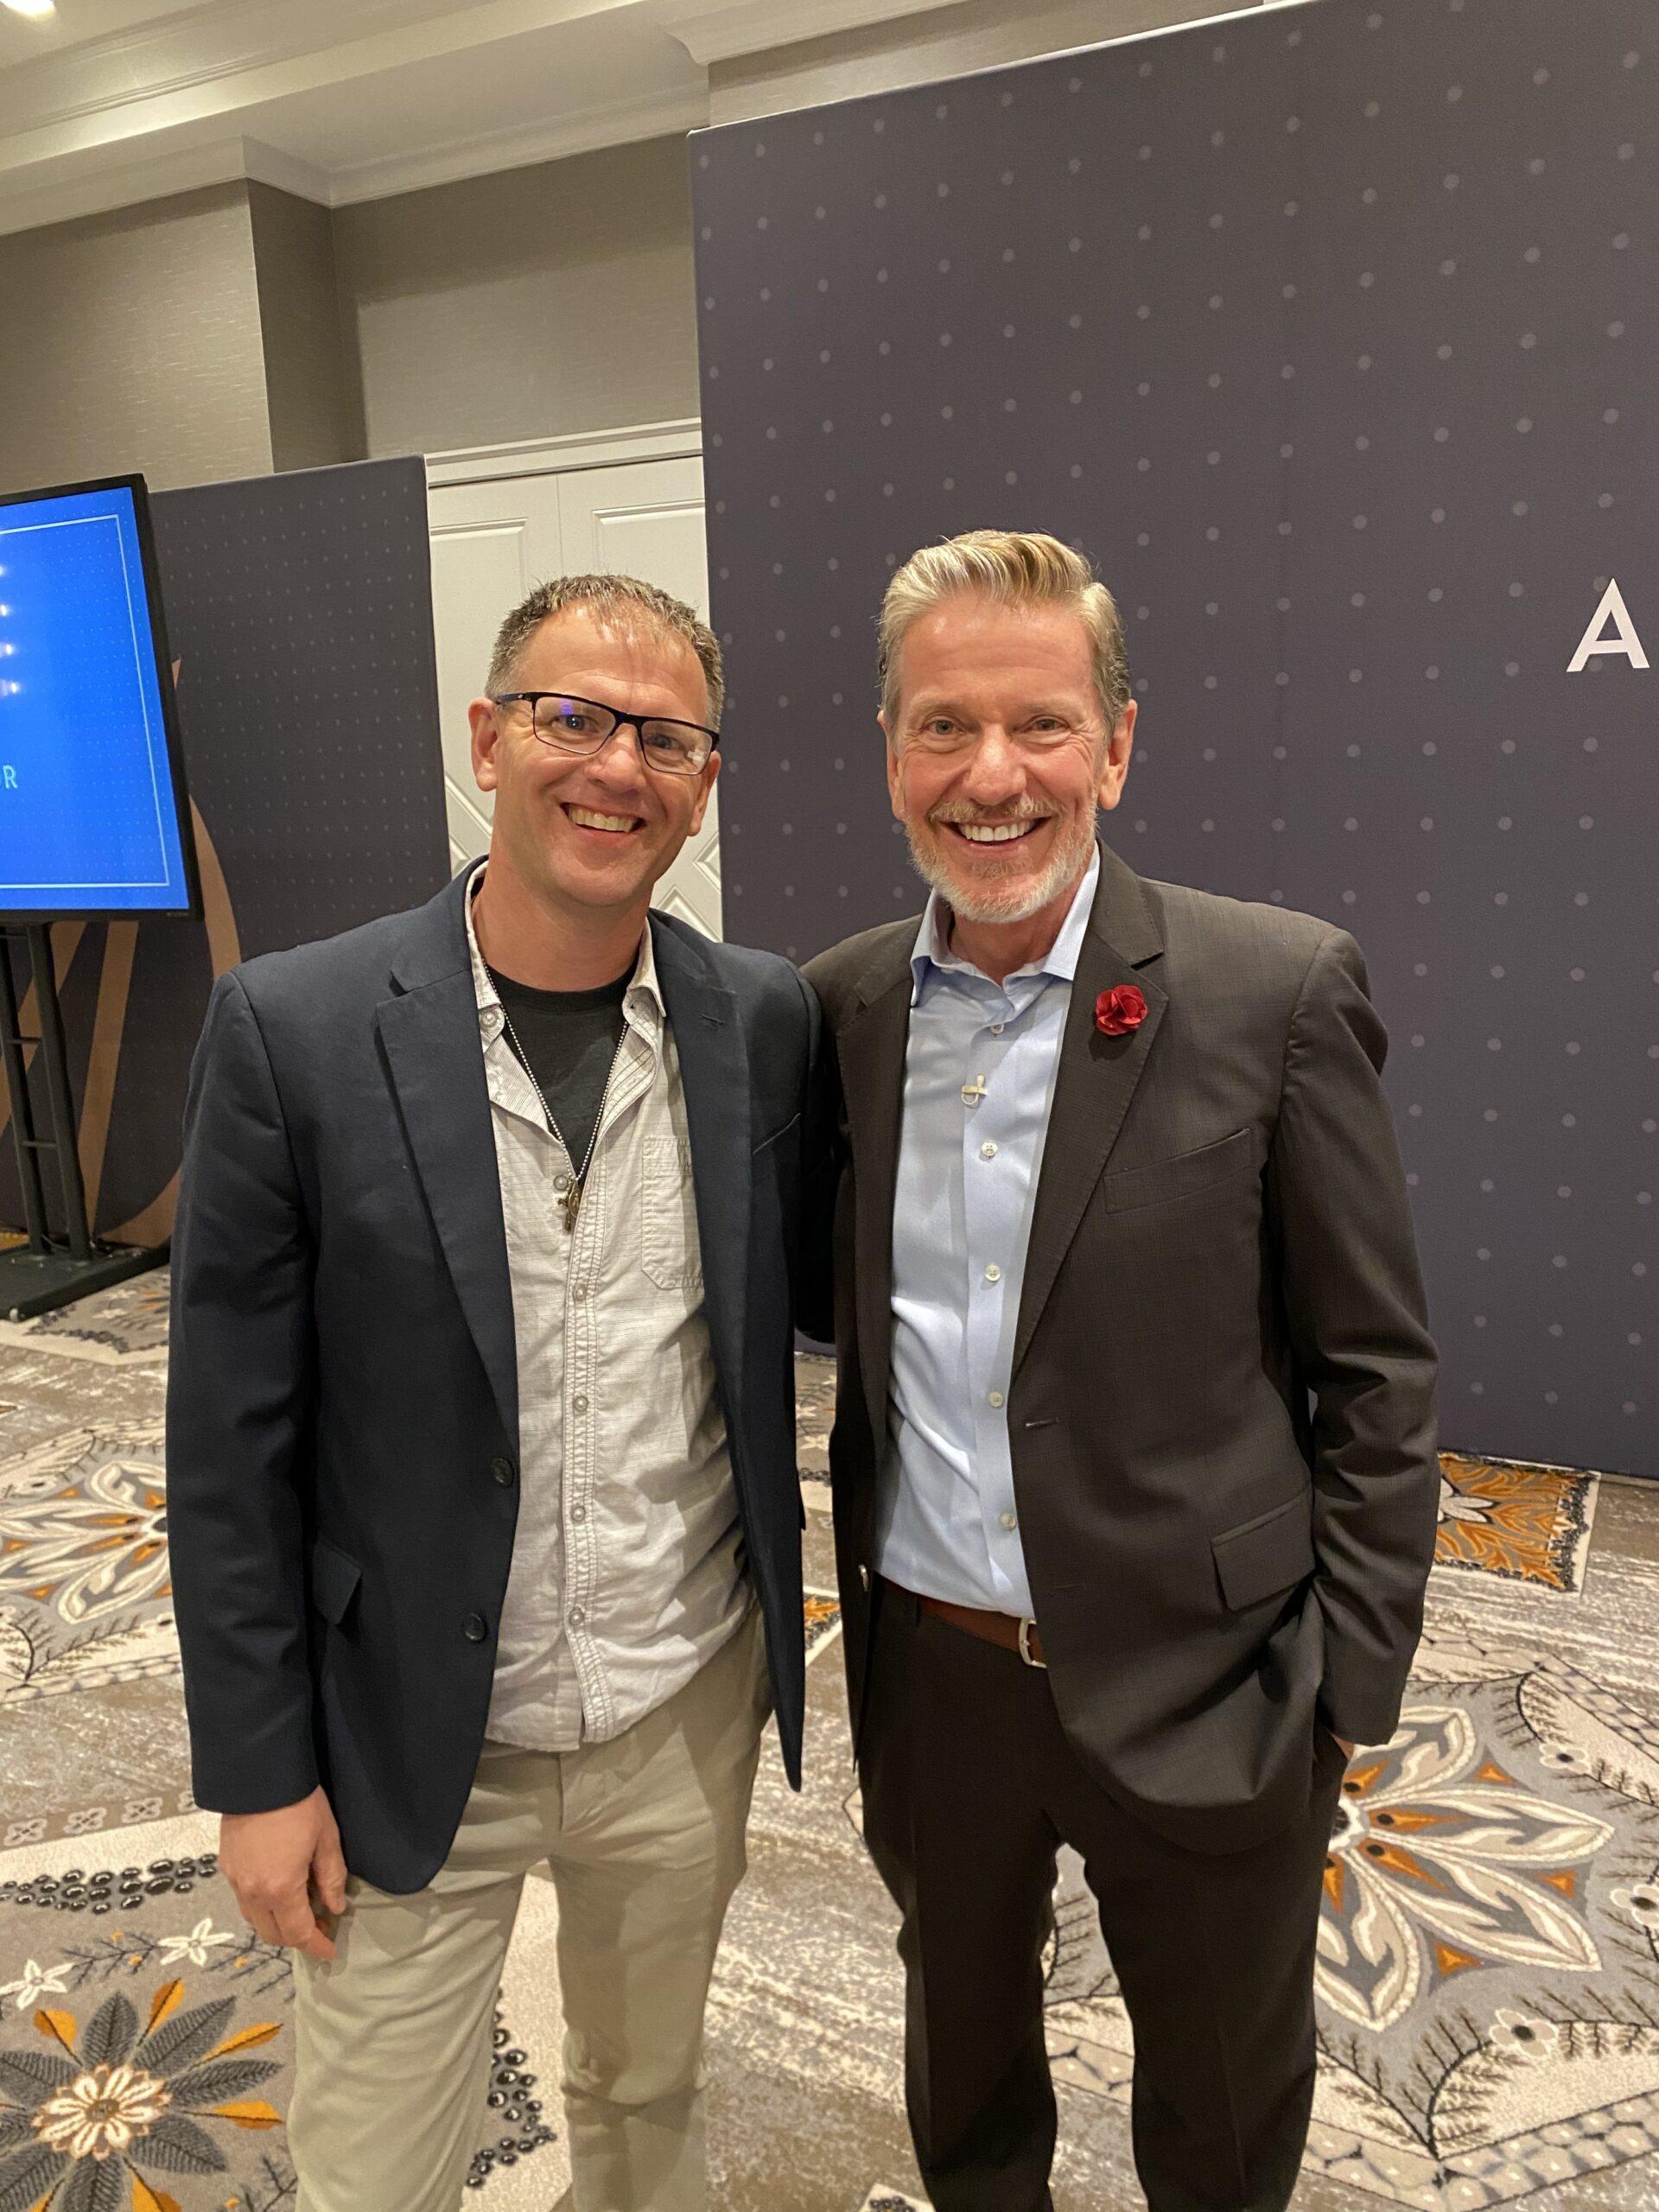 Dr Matthew Harkness with Michael Hyatt